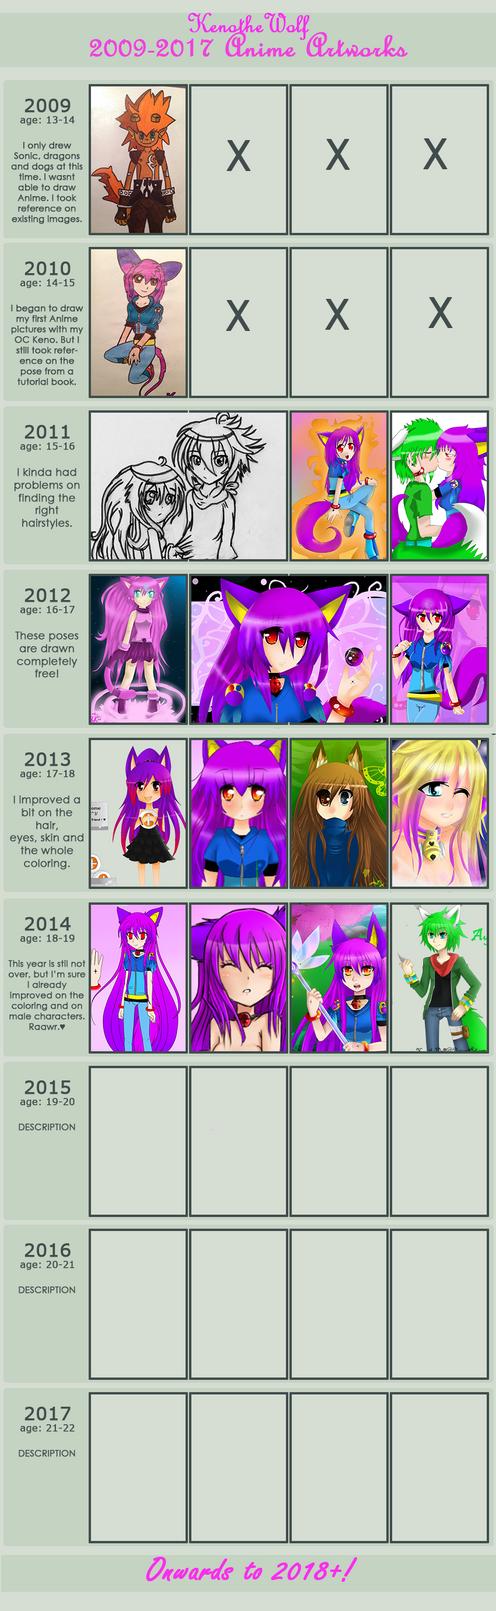 [KenotheWolf] -History of Art (Anime) - 2009-2014 by KenotheWolf